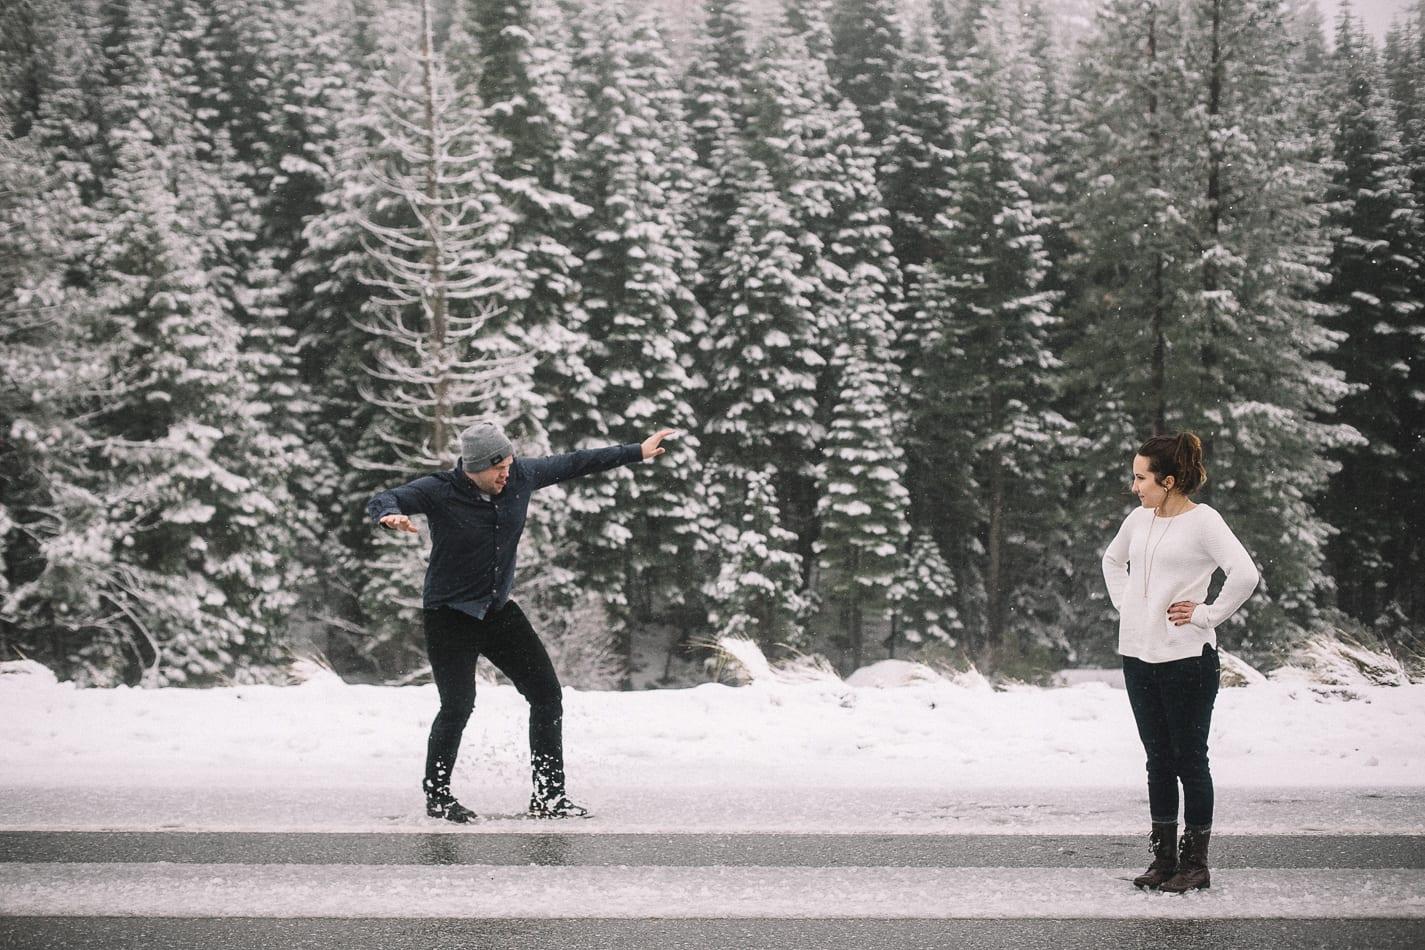 mount-lassen-winter-engagement-photo-16